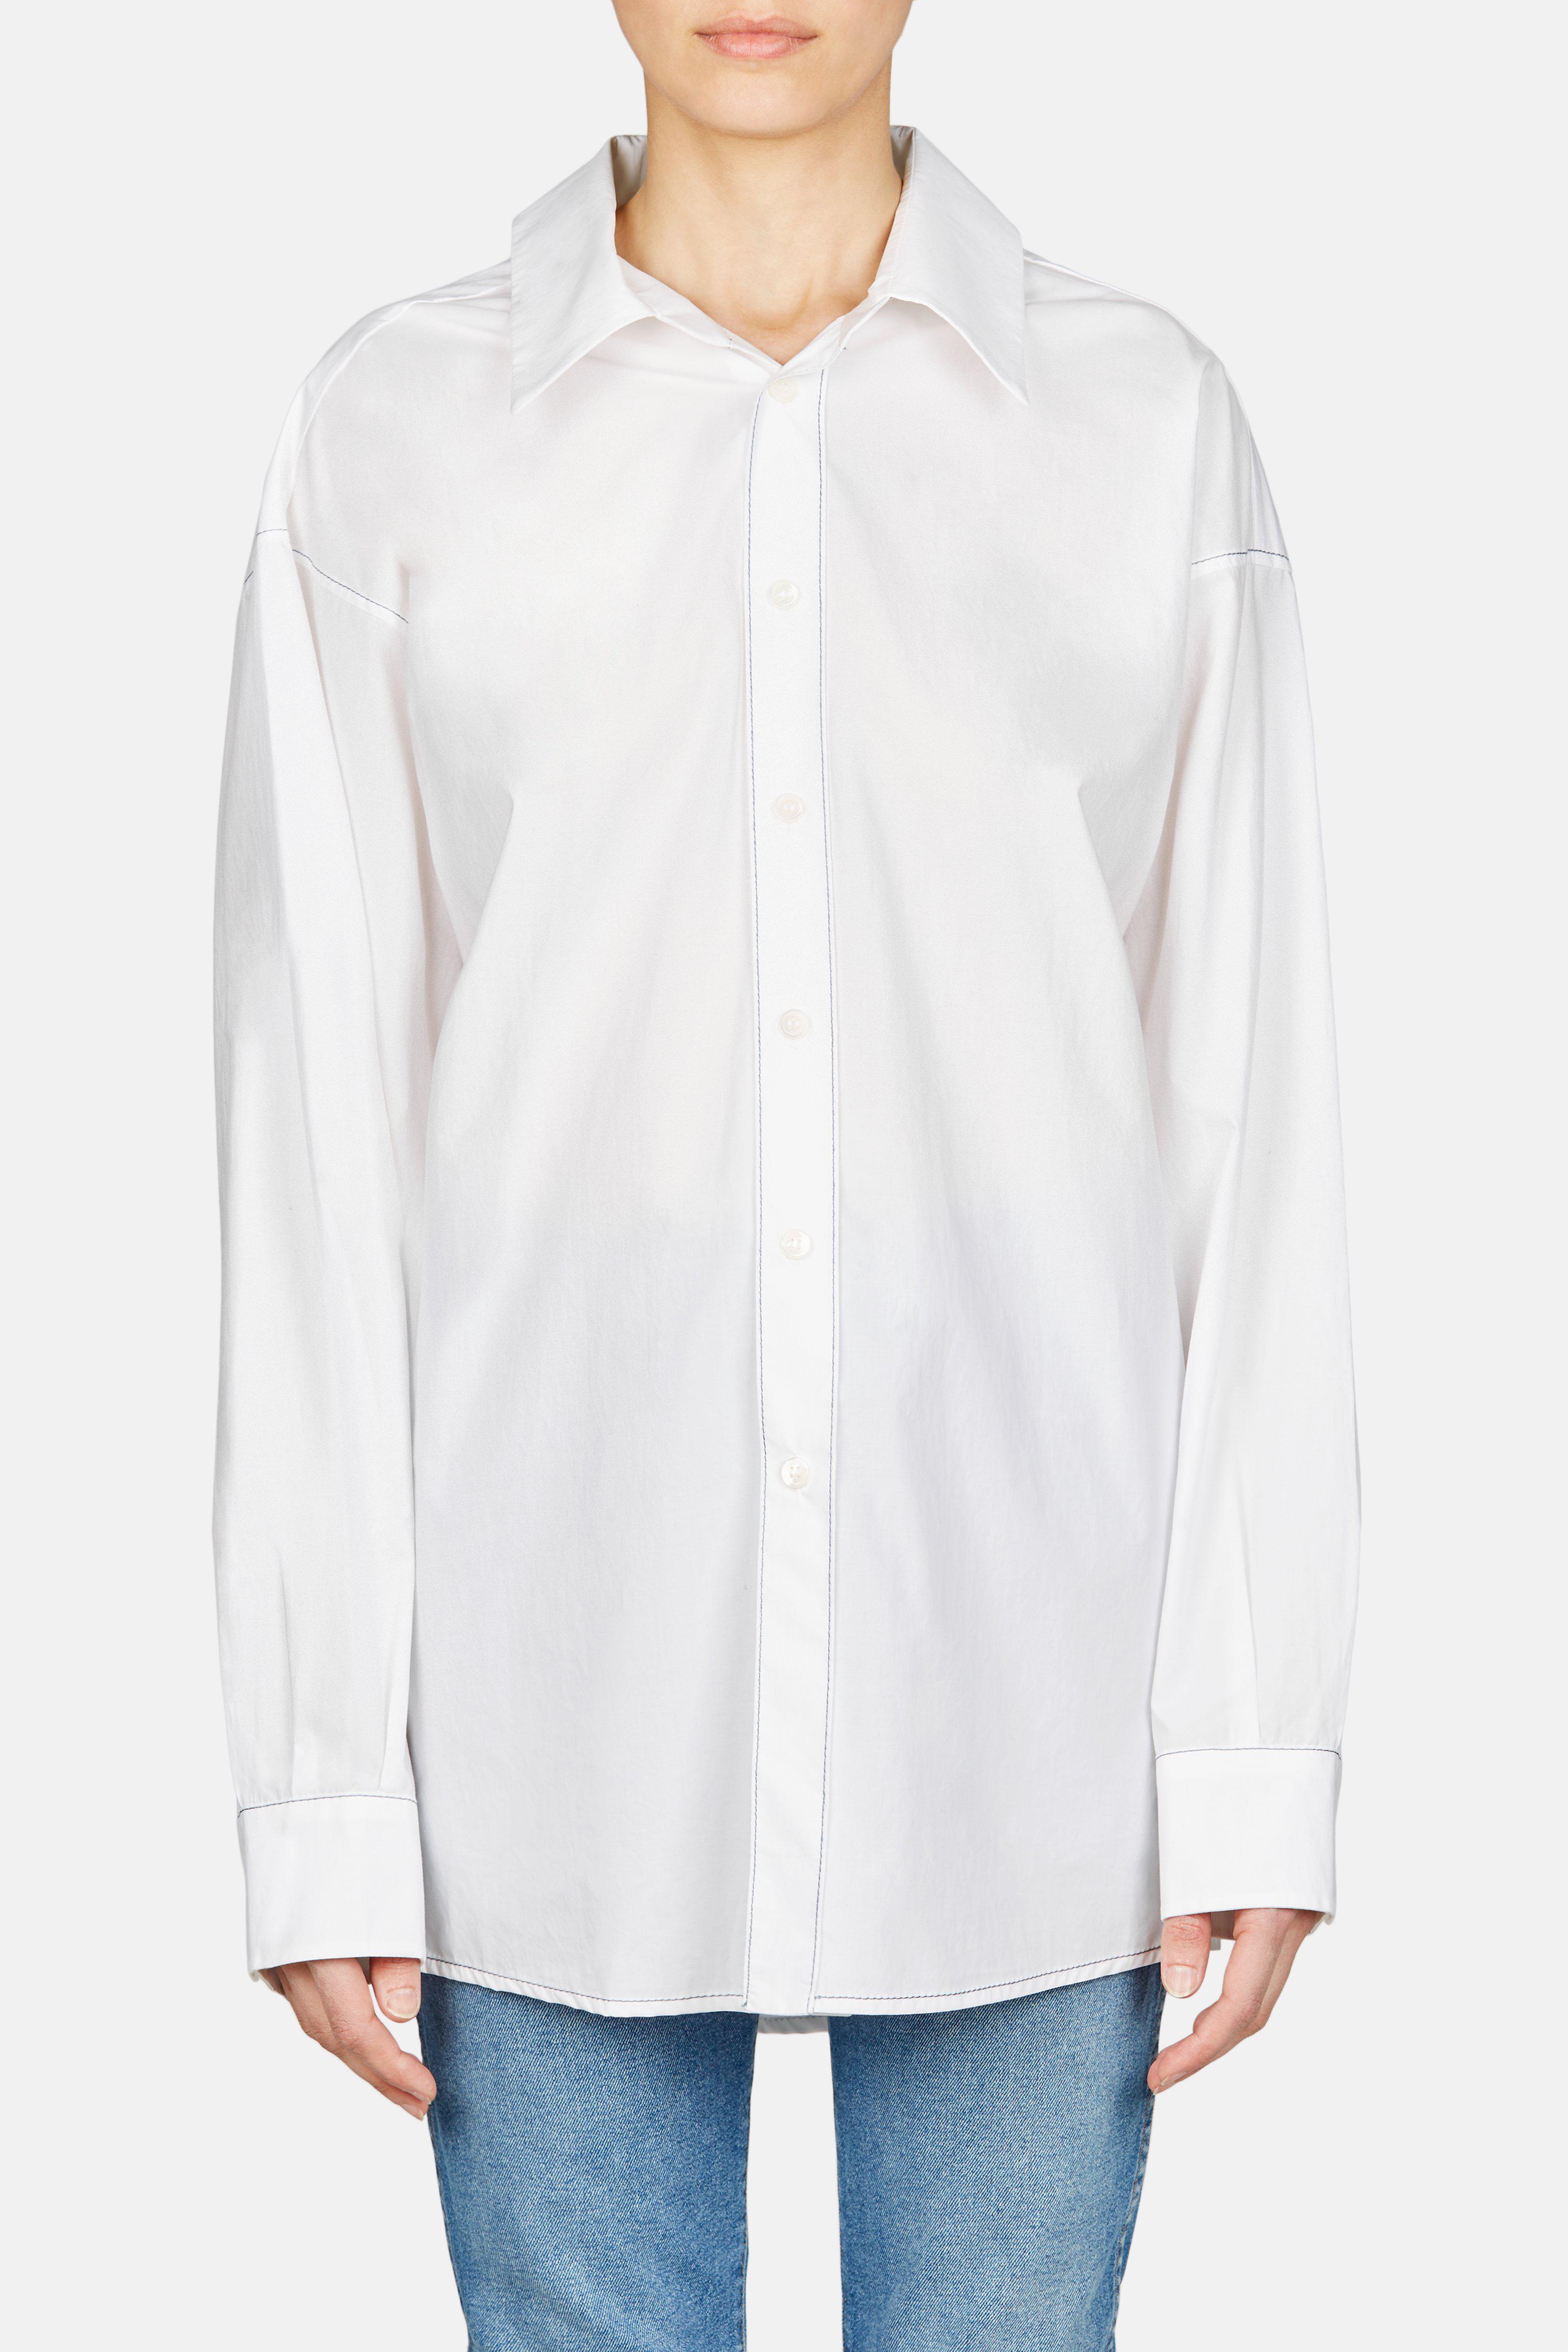 oversized neckline shirt - White Marni Buy Online New A3z0SZhej